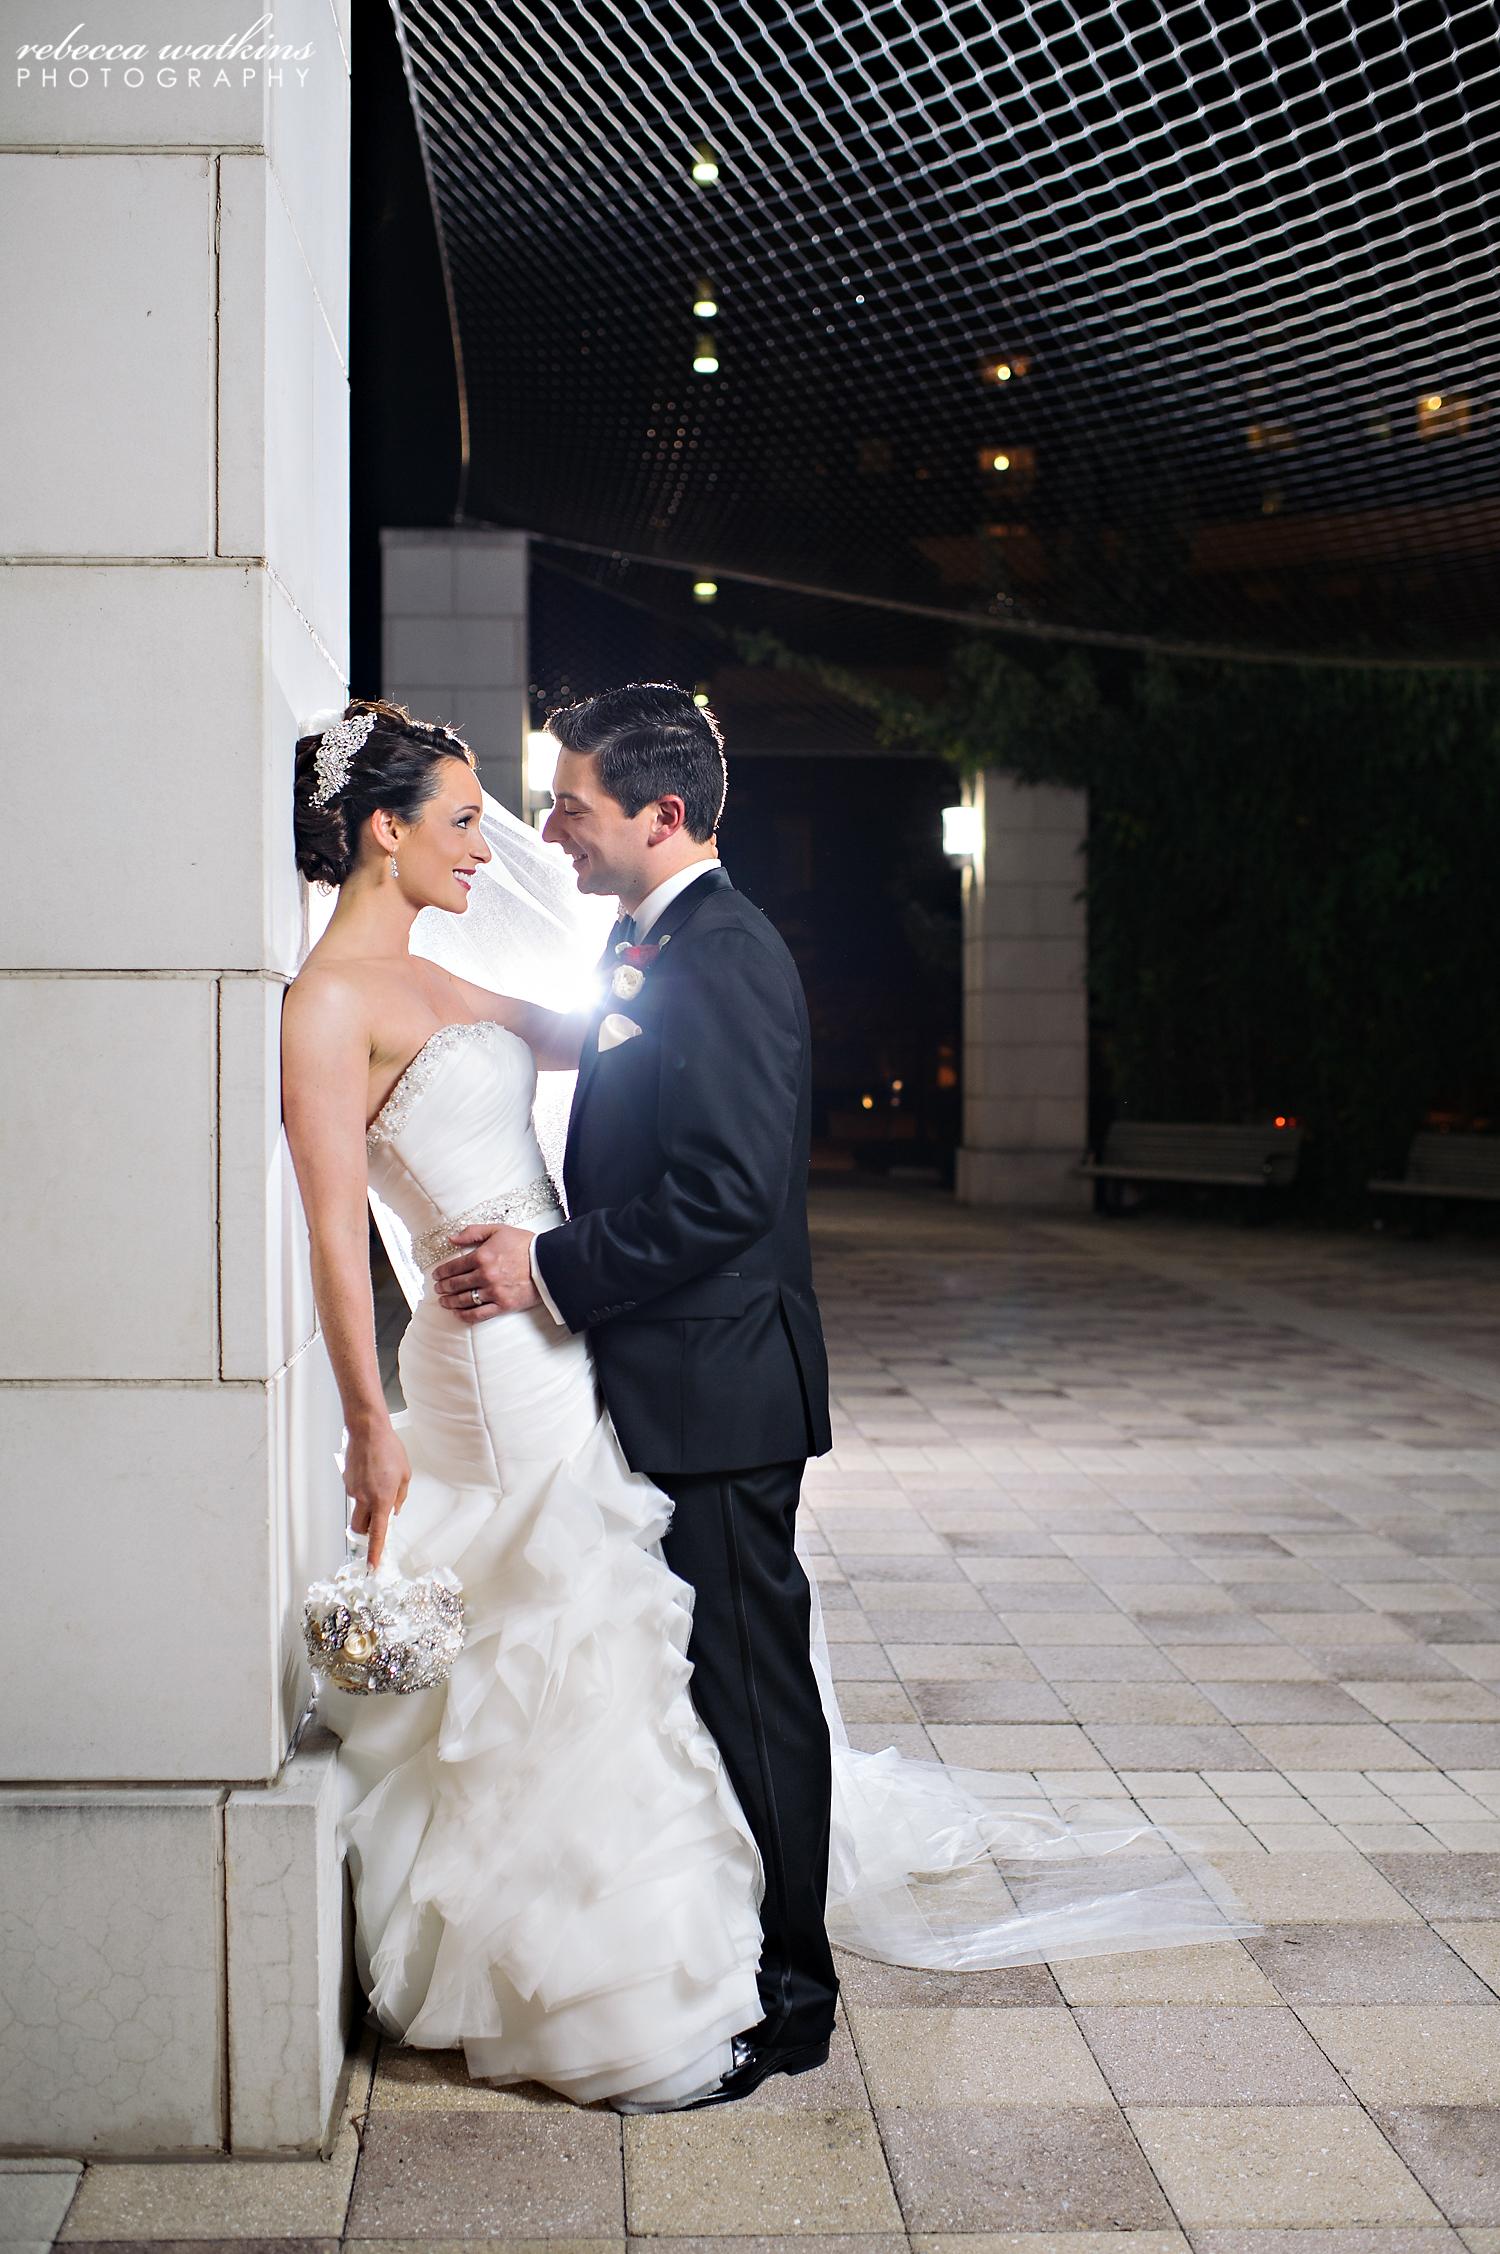 rebeccawatkinsphotographycarlylealexandriawedding-51.jpg